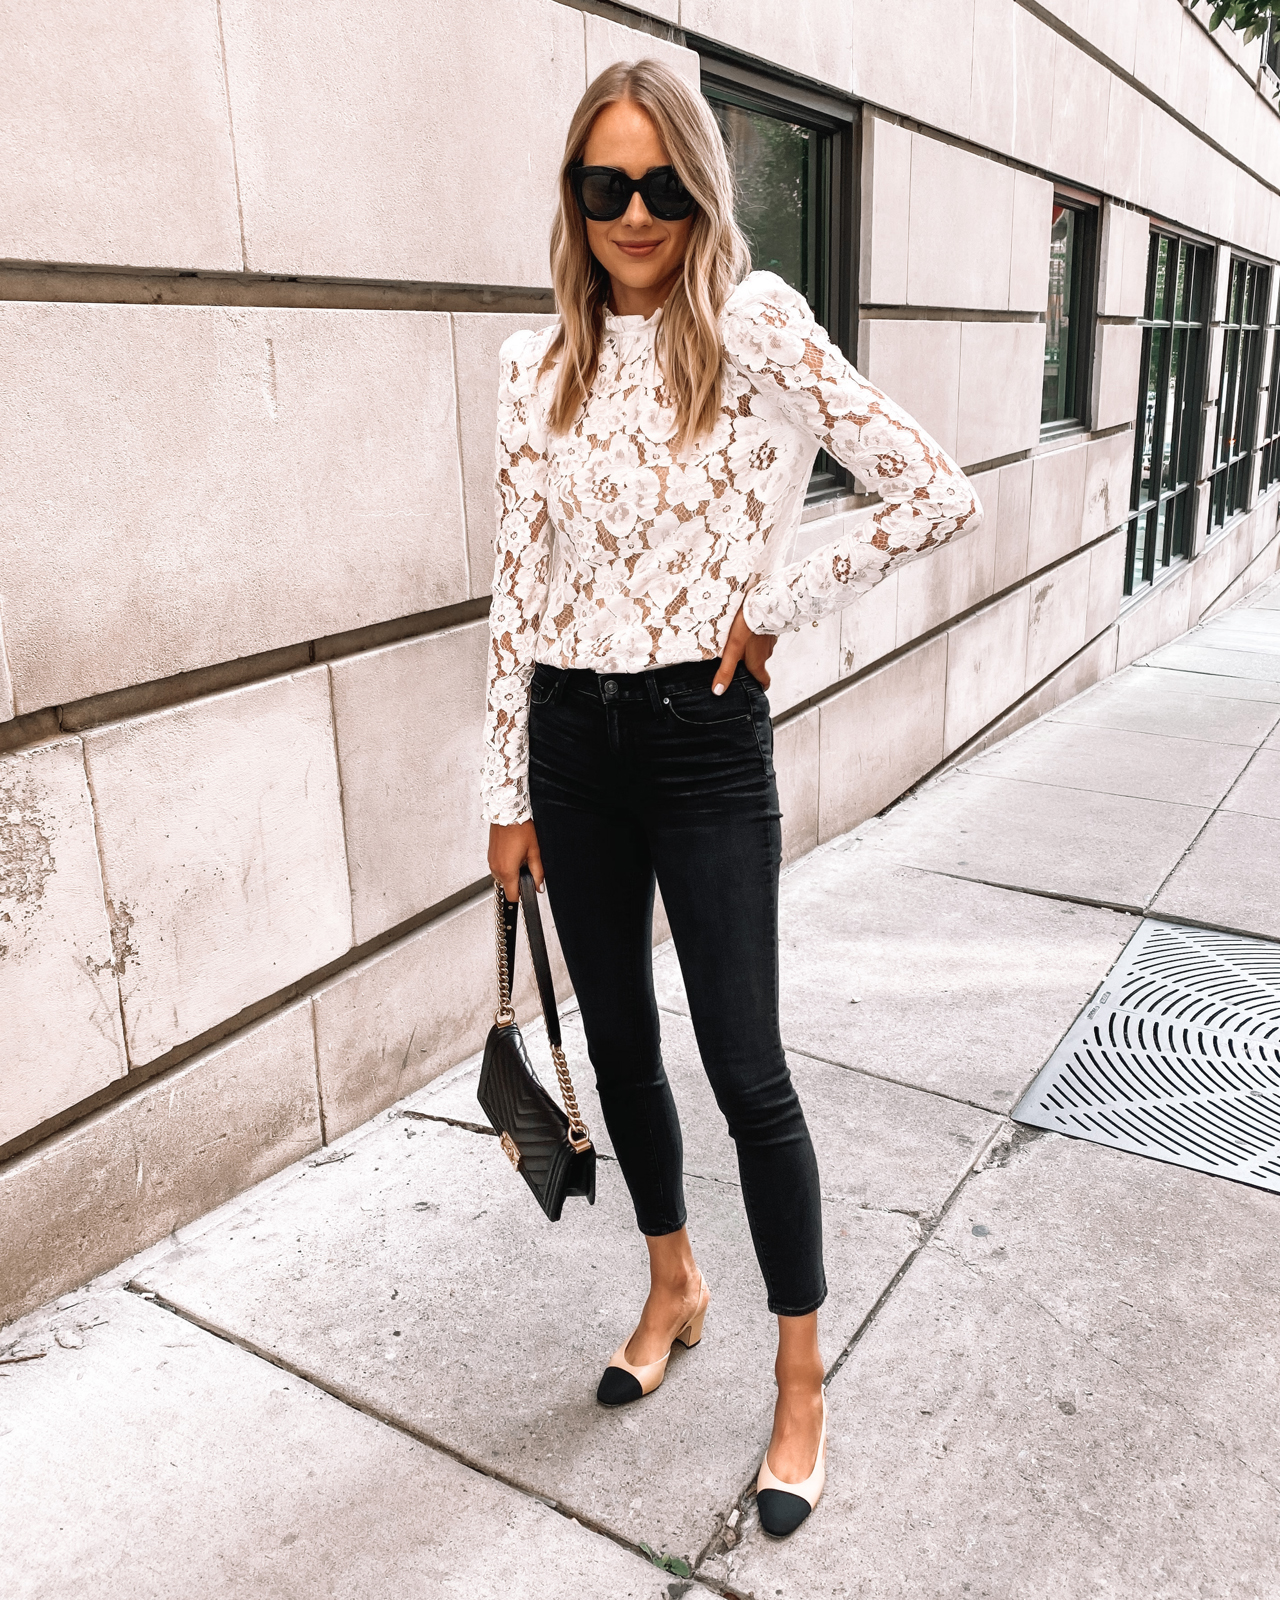 Fashion Jackson Wearing WAYF Emma White Long Sleeve Lace Top Black Skinny Jeans Chanel Slingbacks